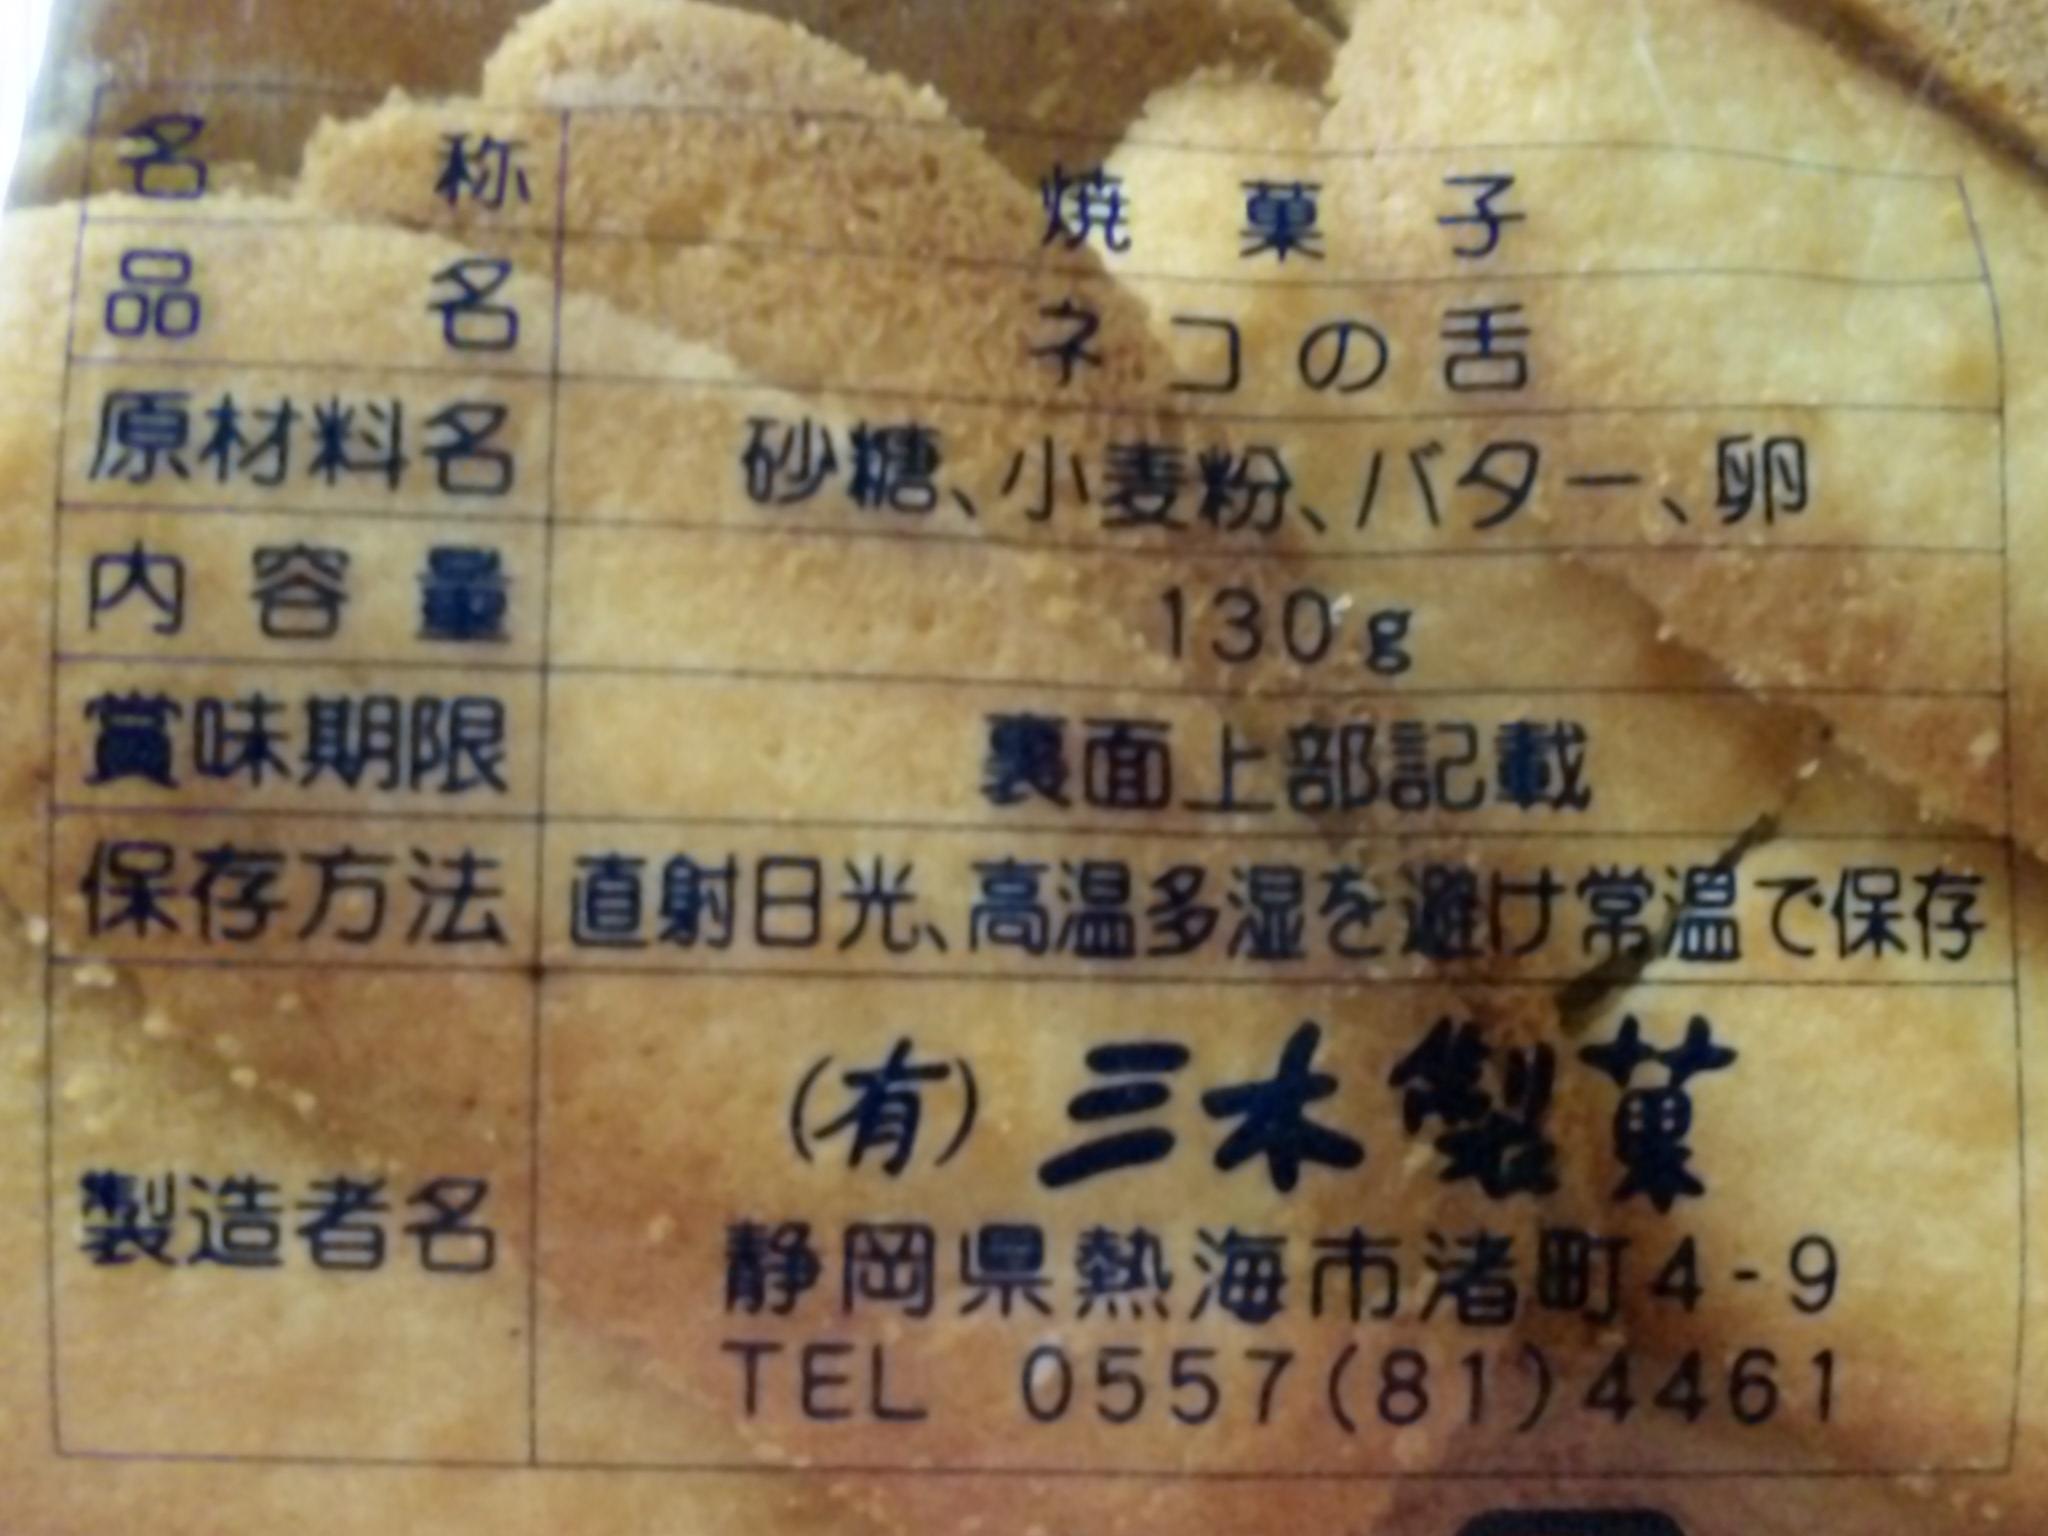 三木製菓 駅前第一ビル店 name=